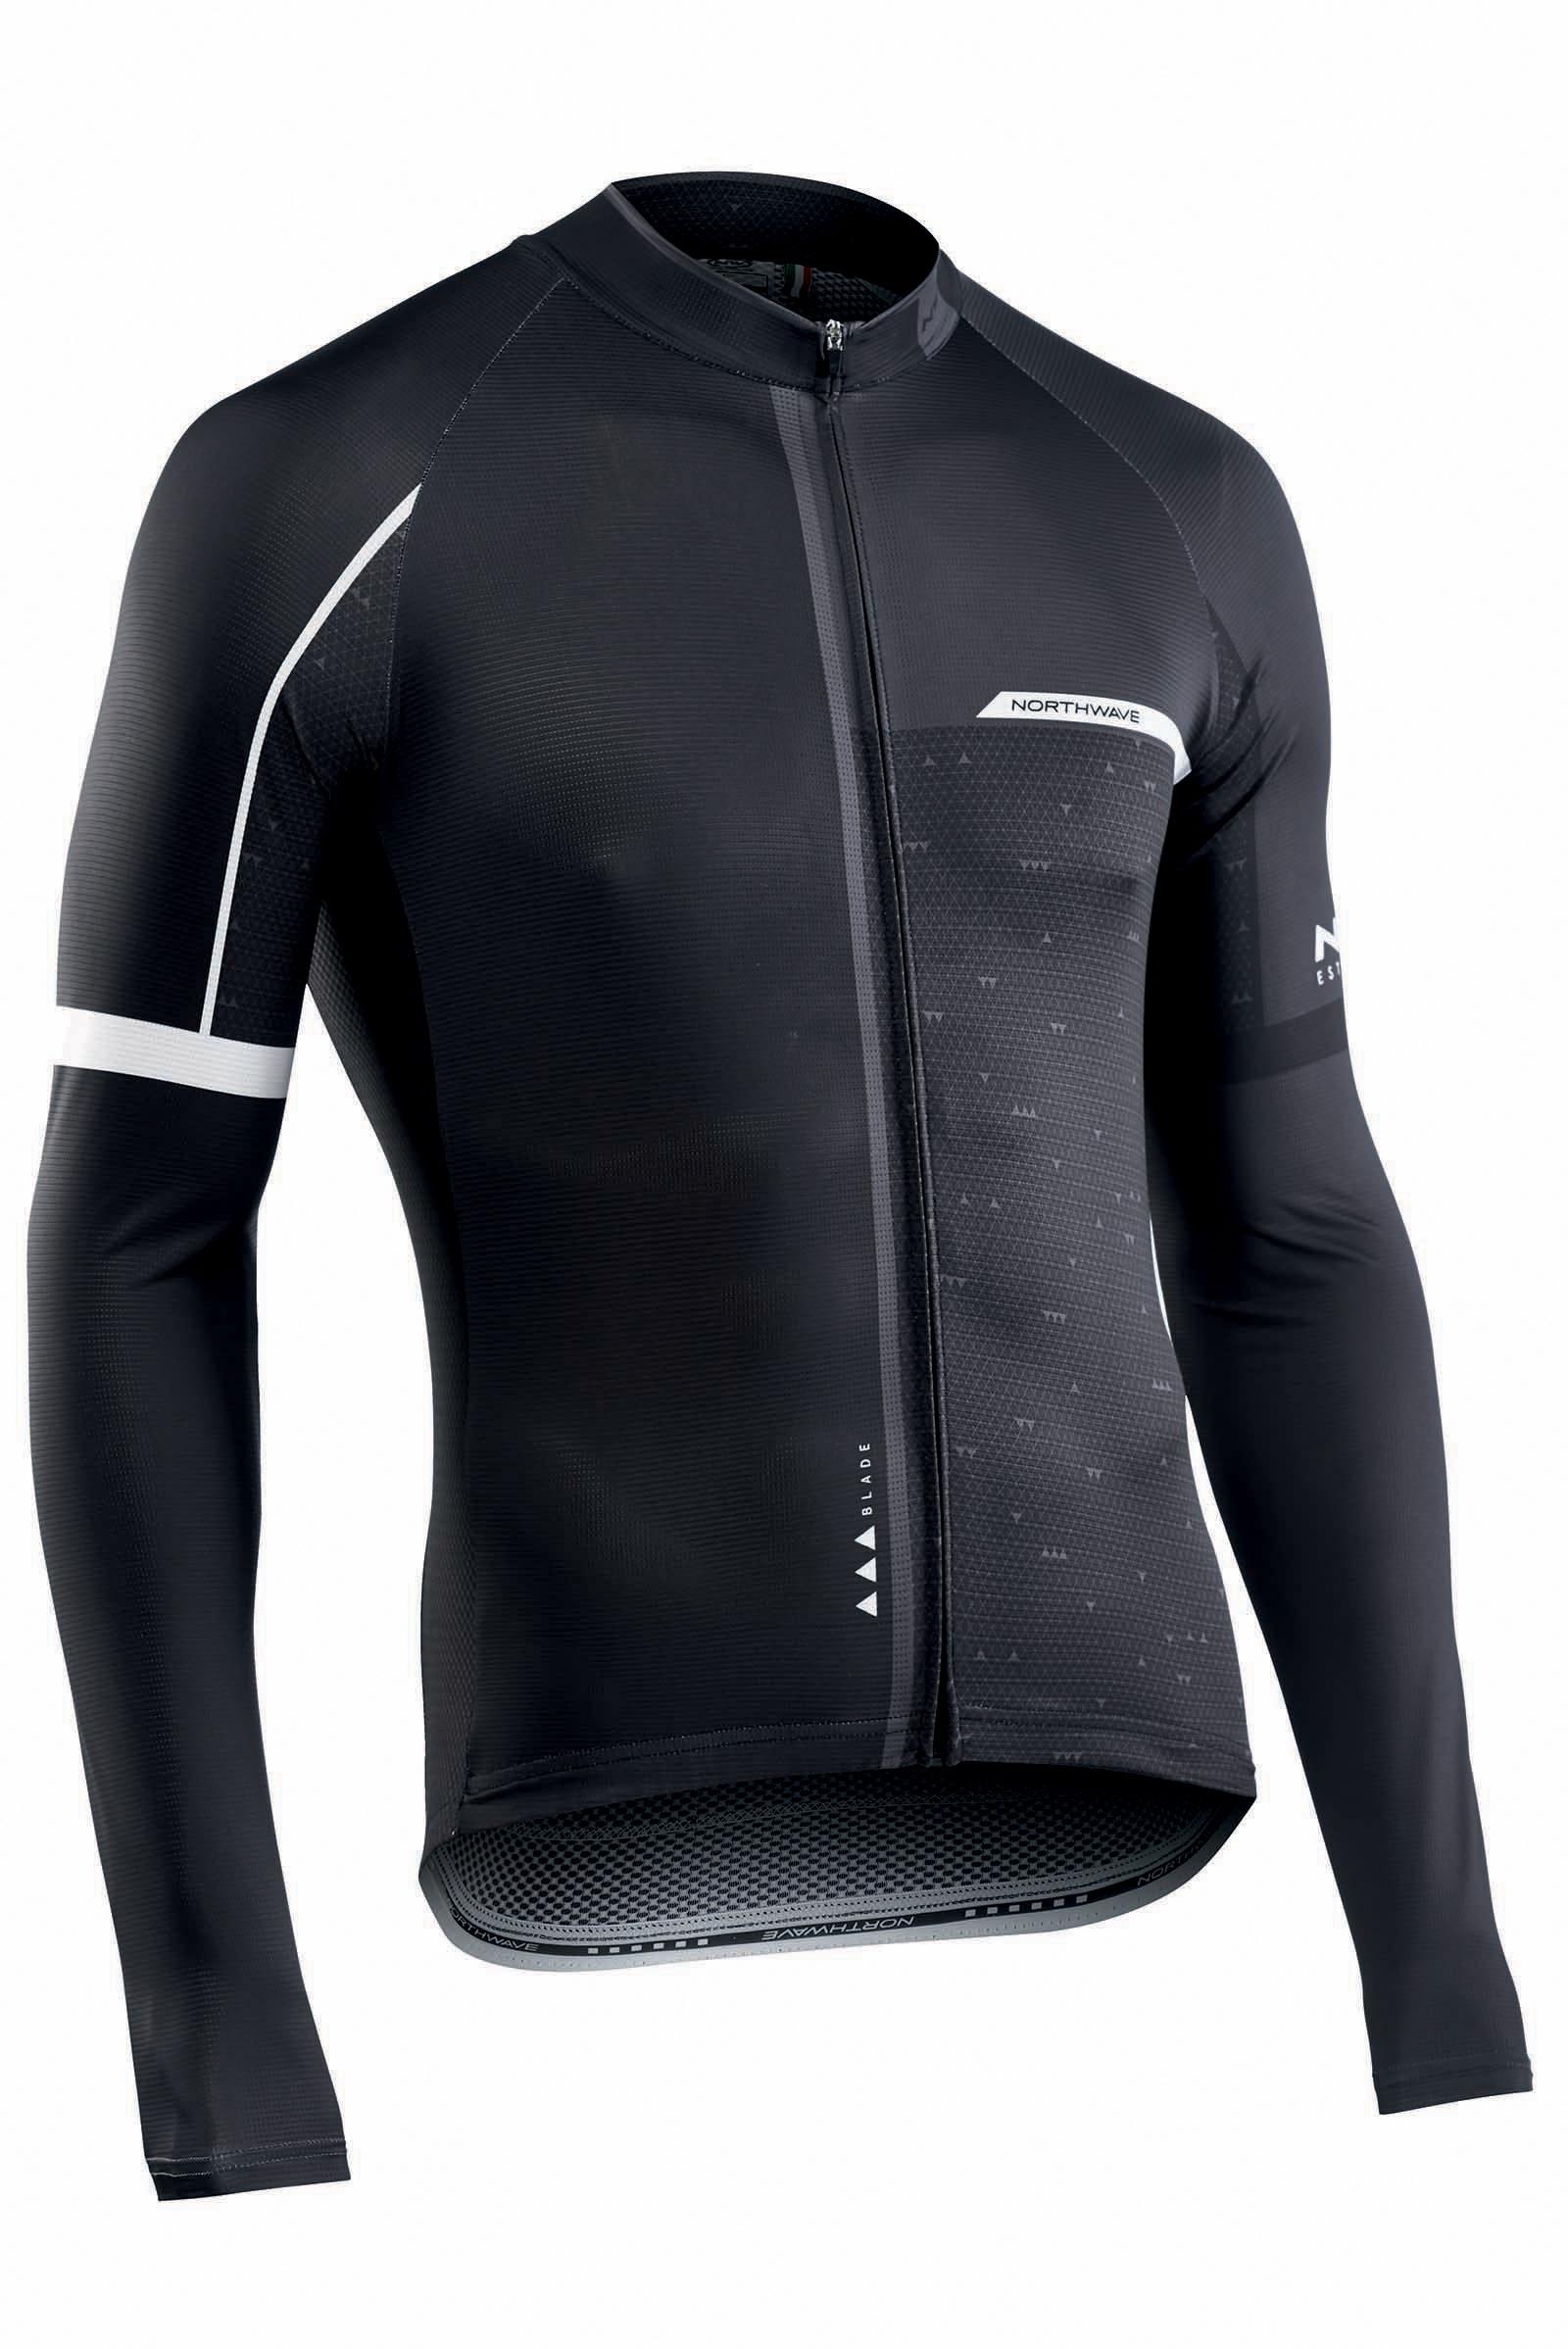 NORTHWAVE Man cycling jersey long sleeves BLADE2 black